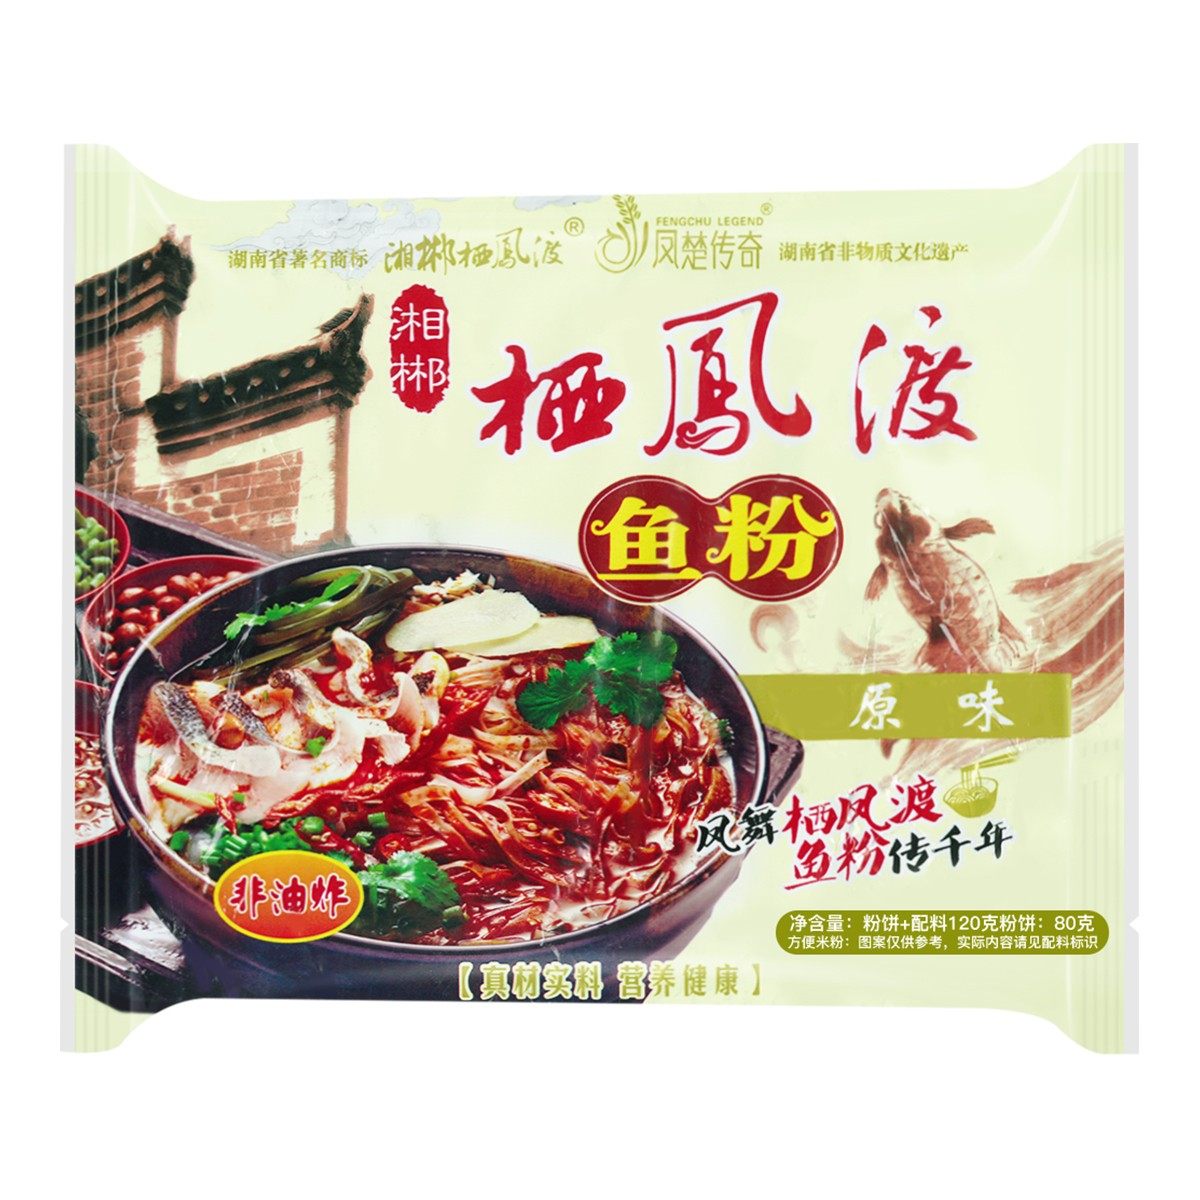 QIFENGDU Fish Instant Noodle Original Flavor 120g